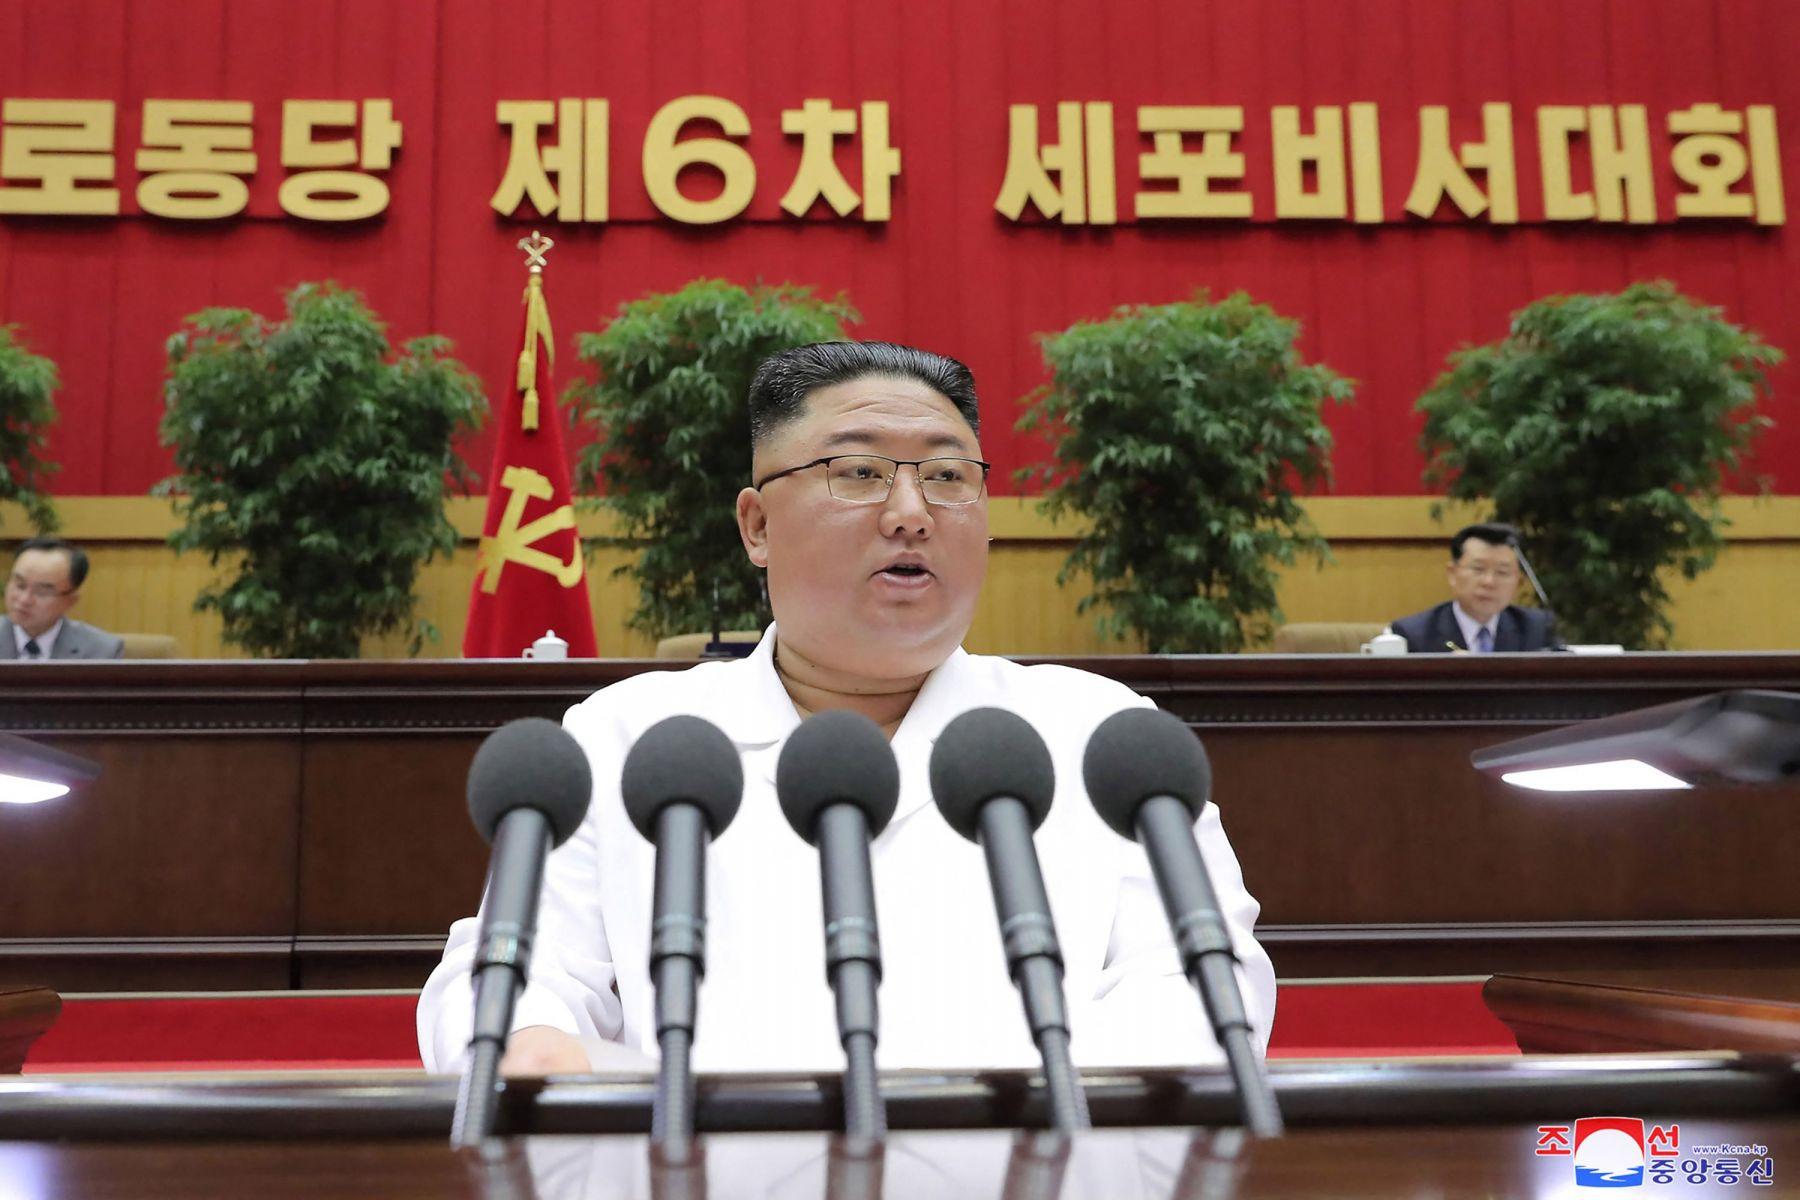 TR / KCNA VIA KNS / AFP